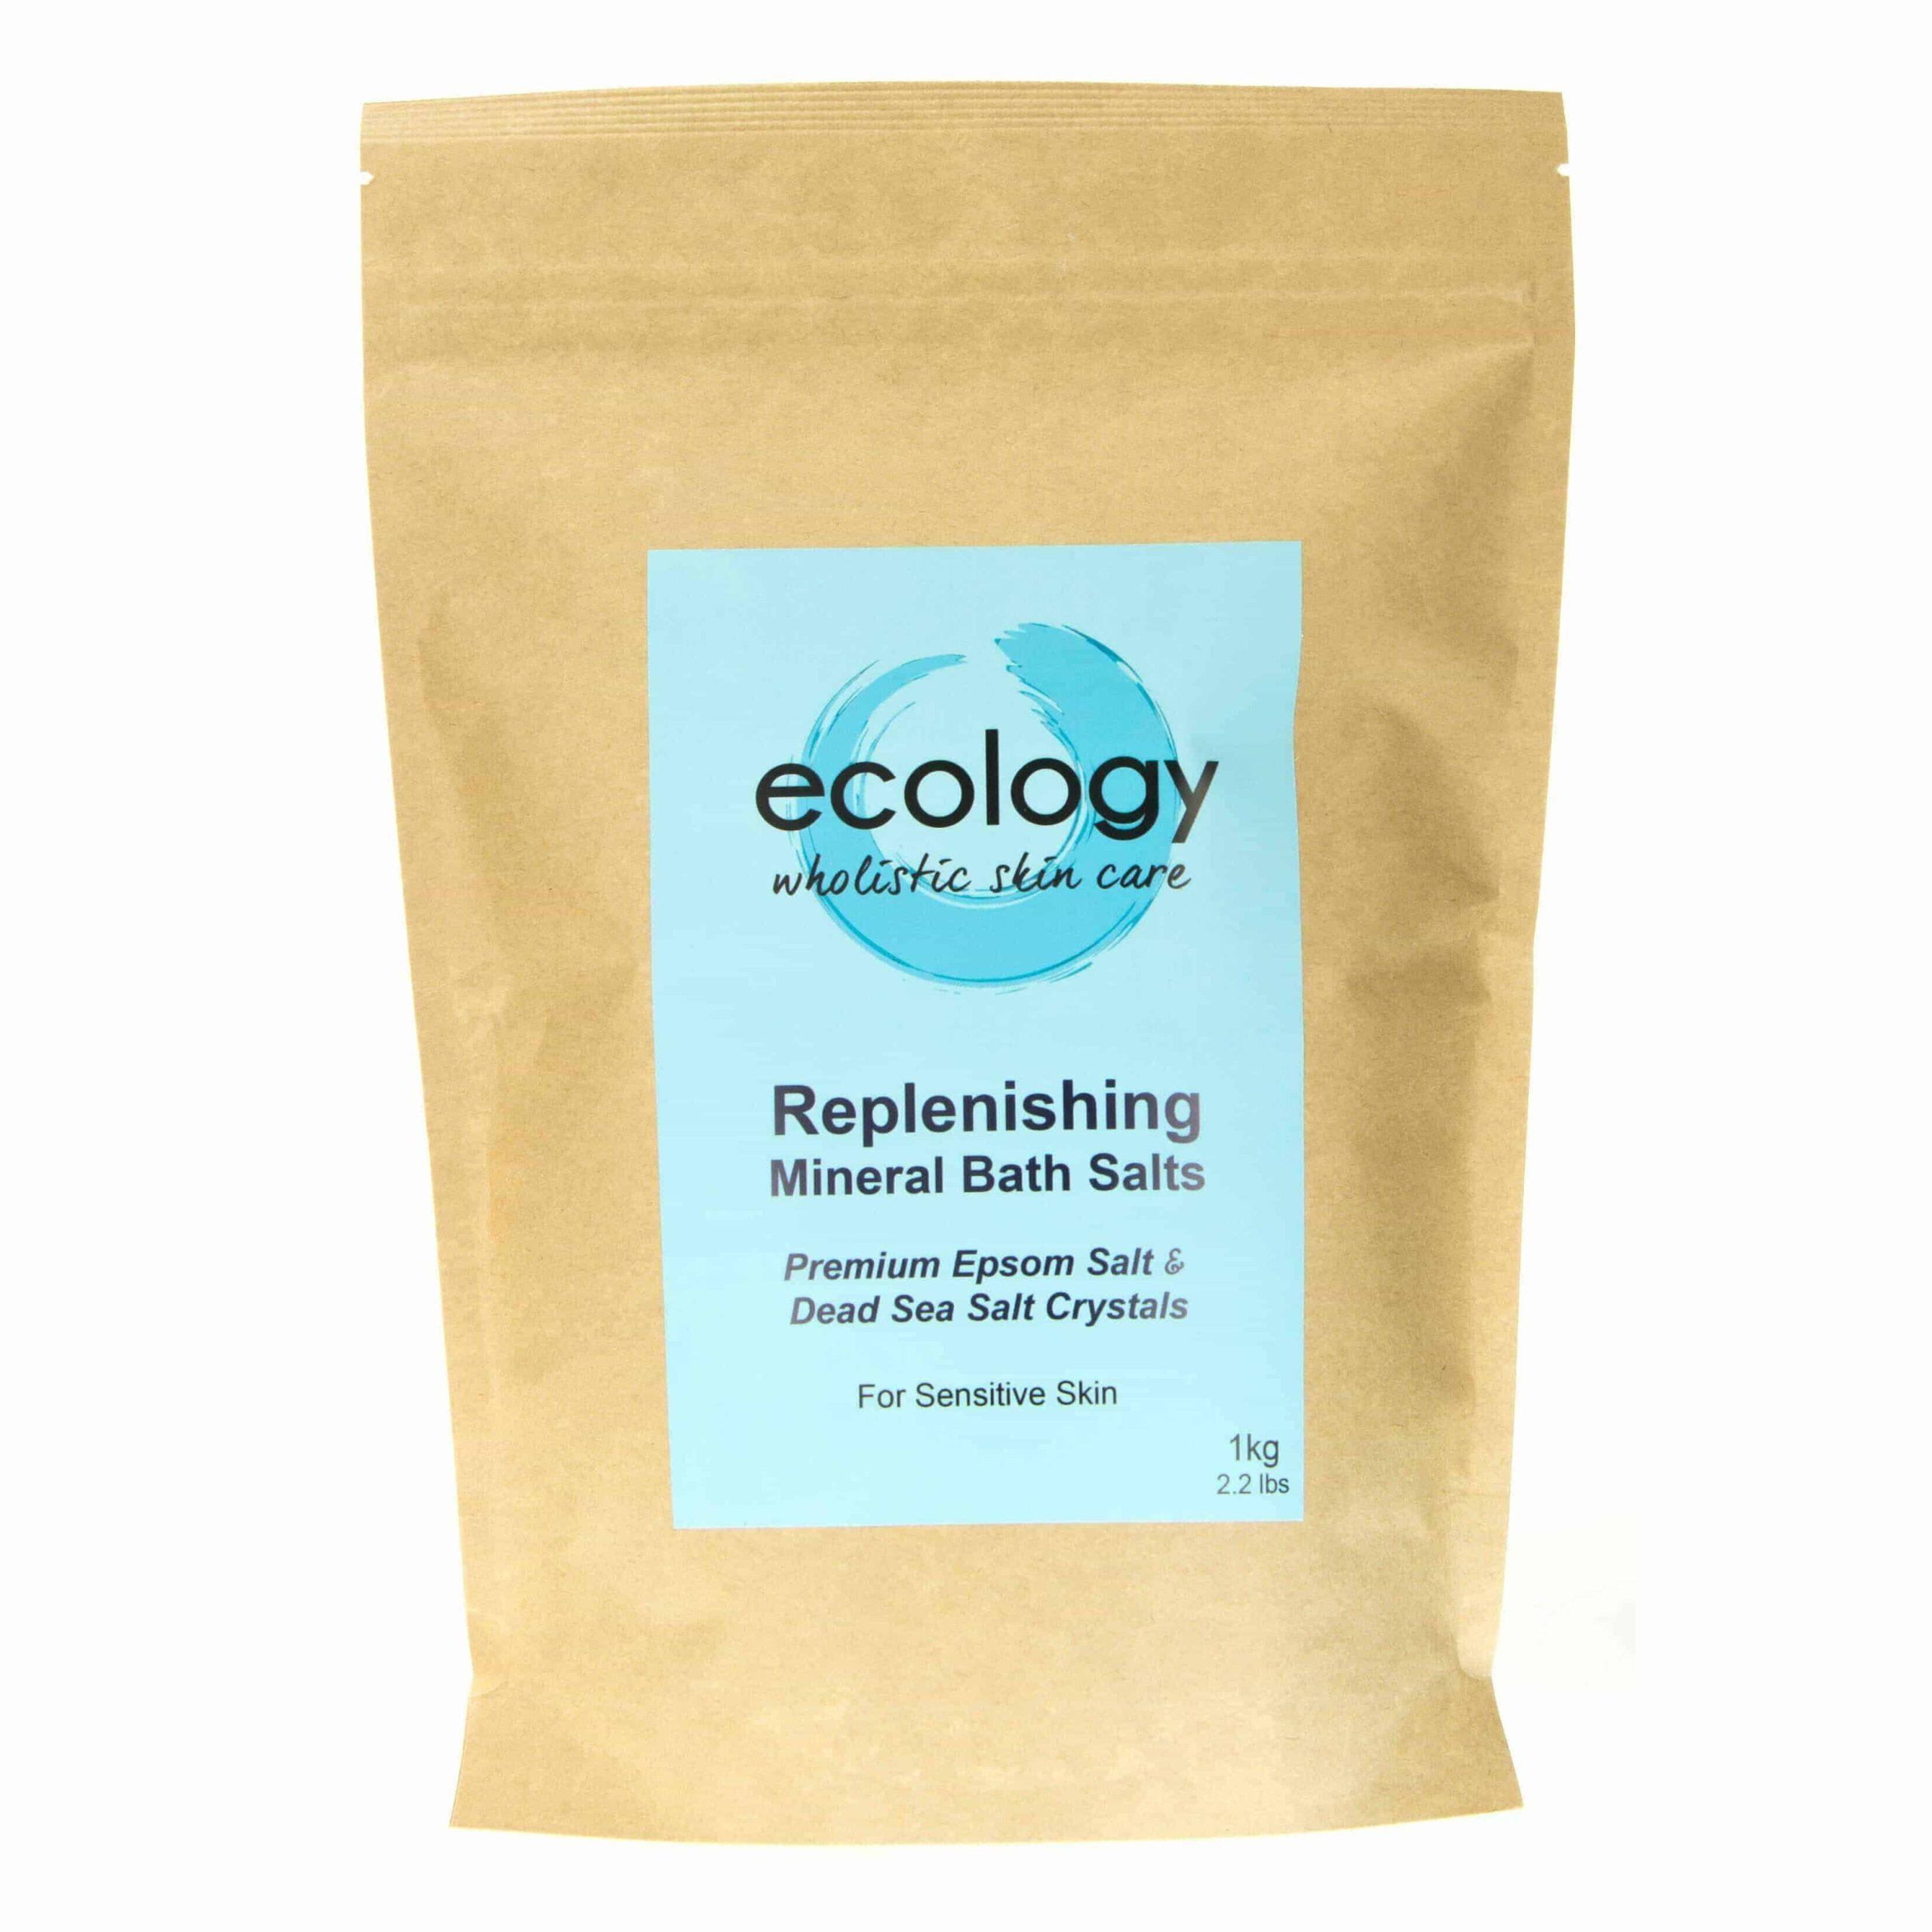 1kg Replenishing Mineral Bath Salts Ecology Skincare